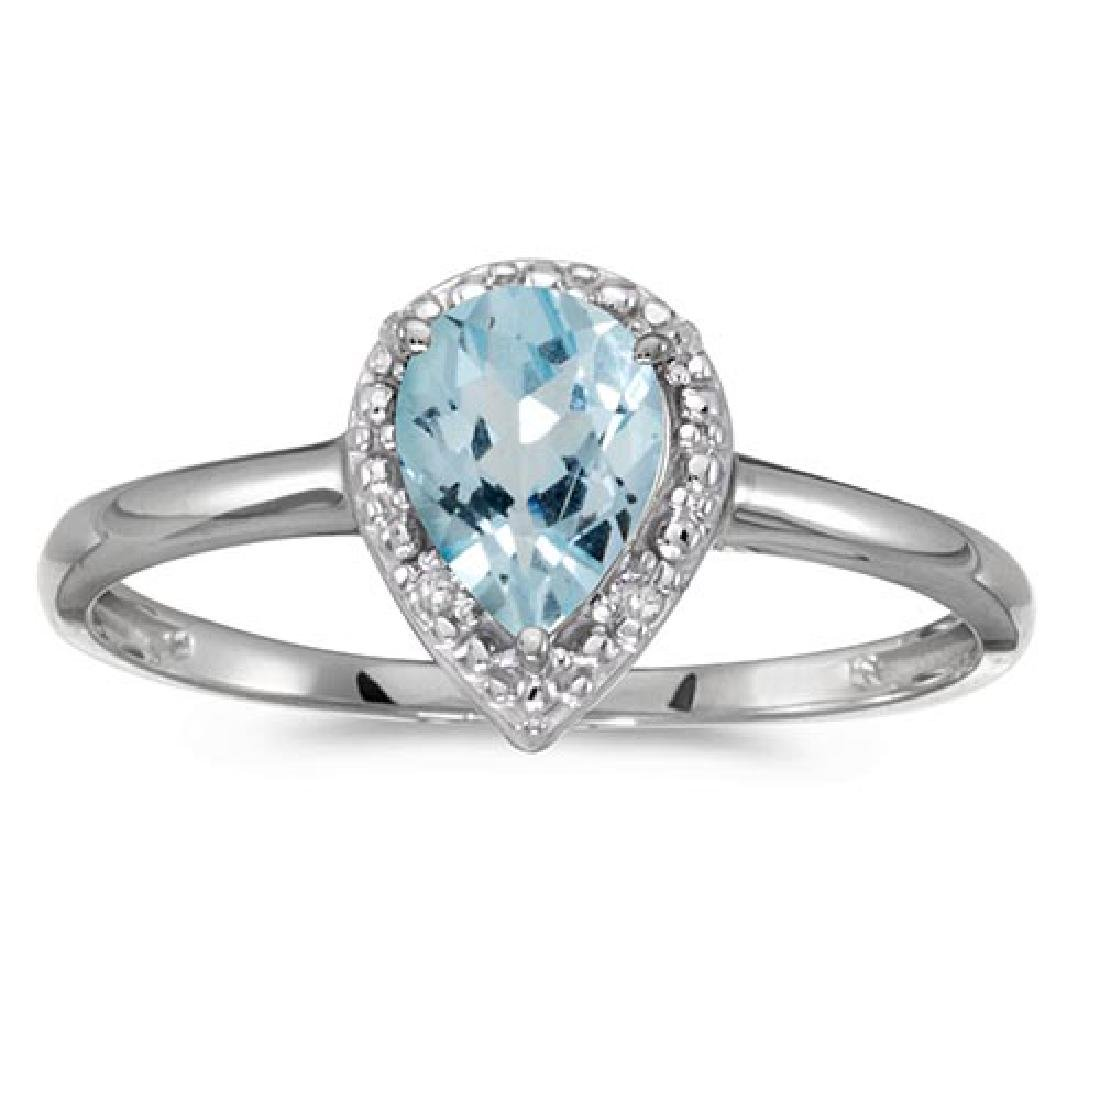 Certified 14k White Gold Pear Aquamarine And Diamond Ri